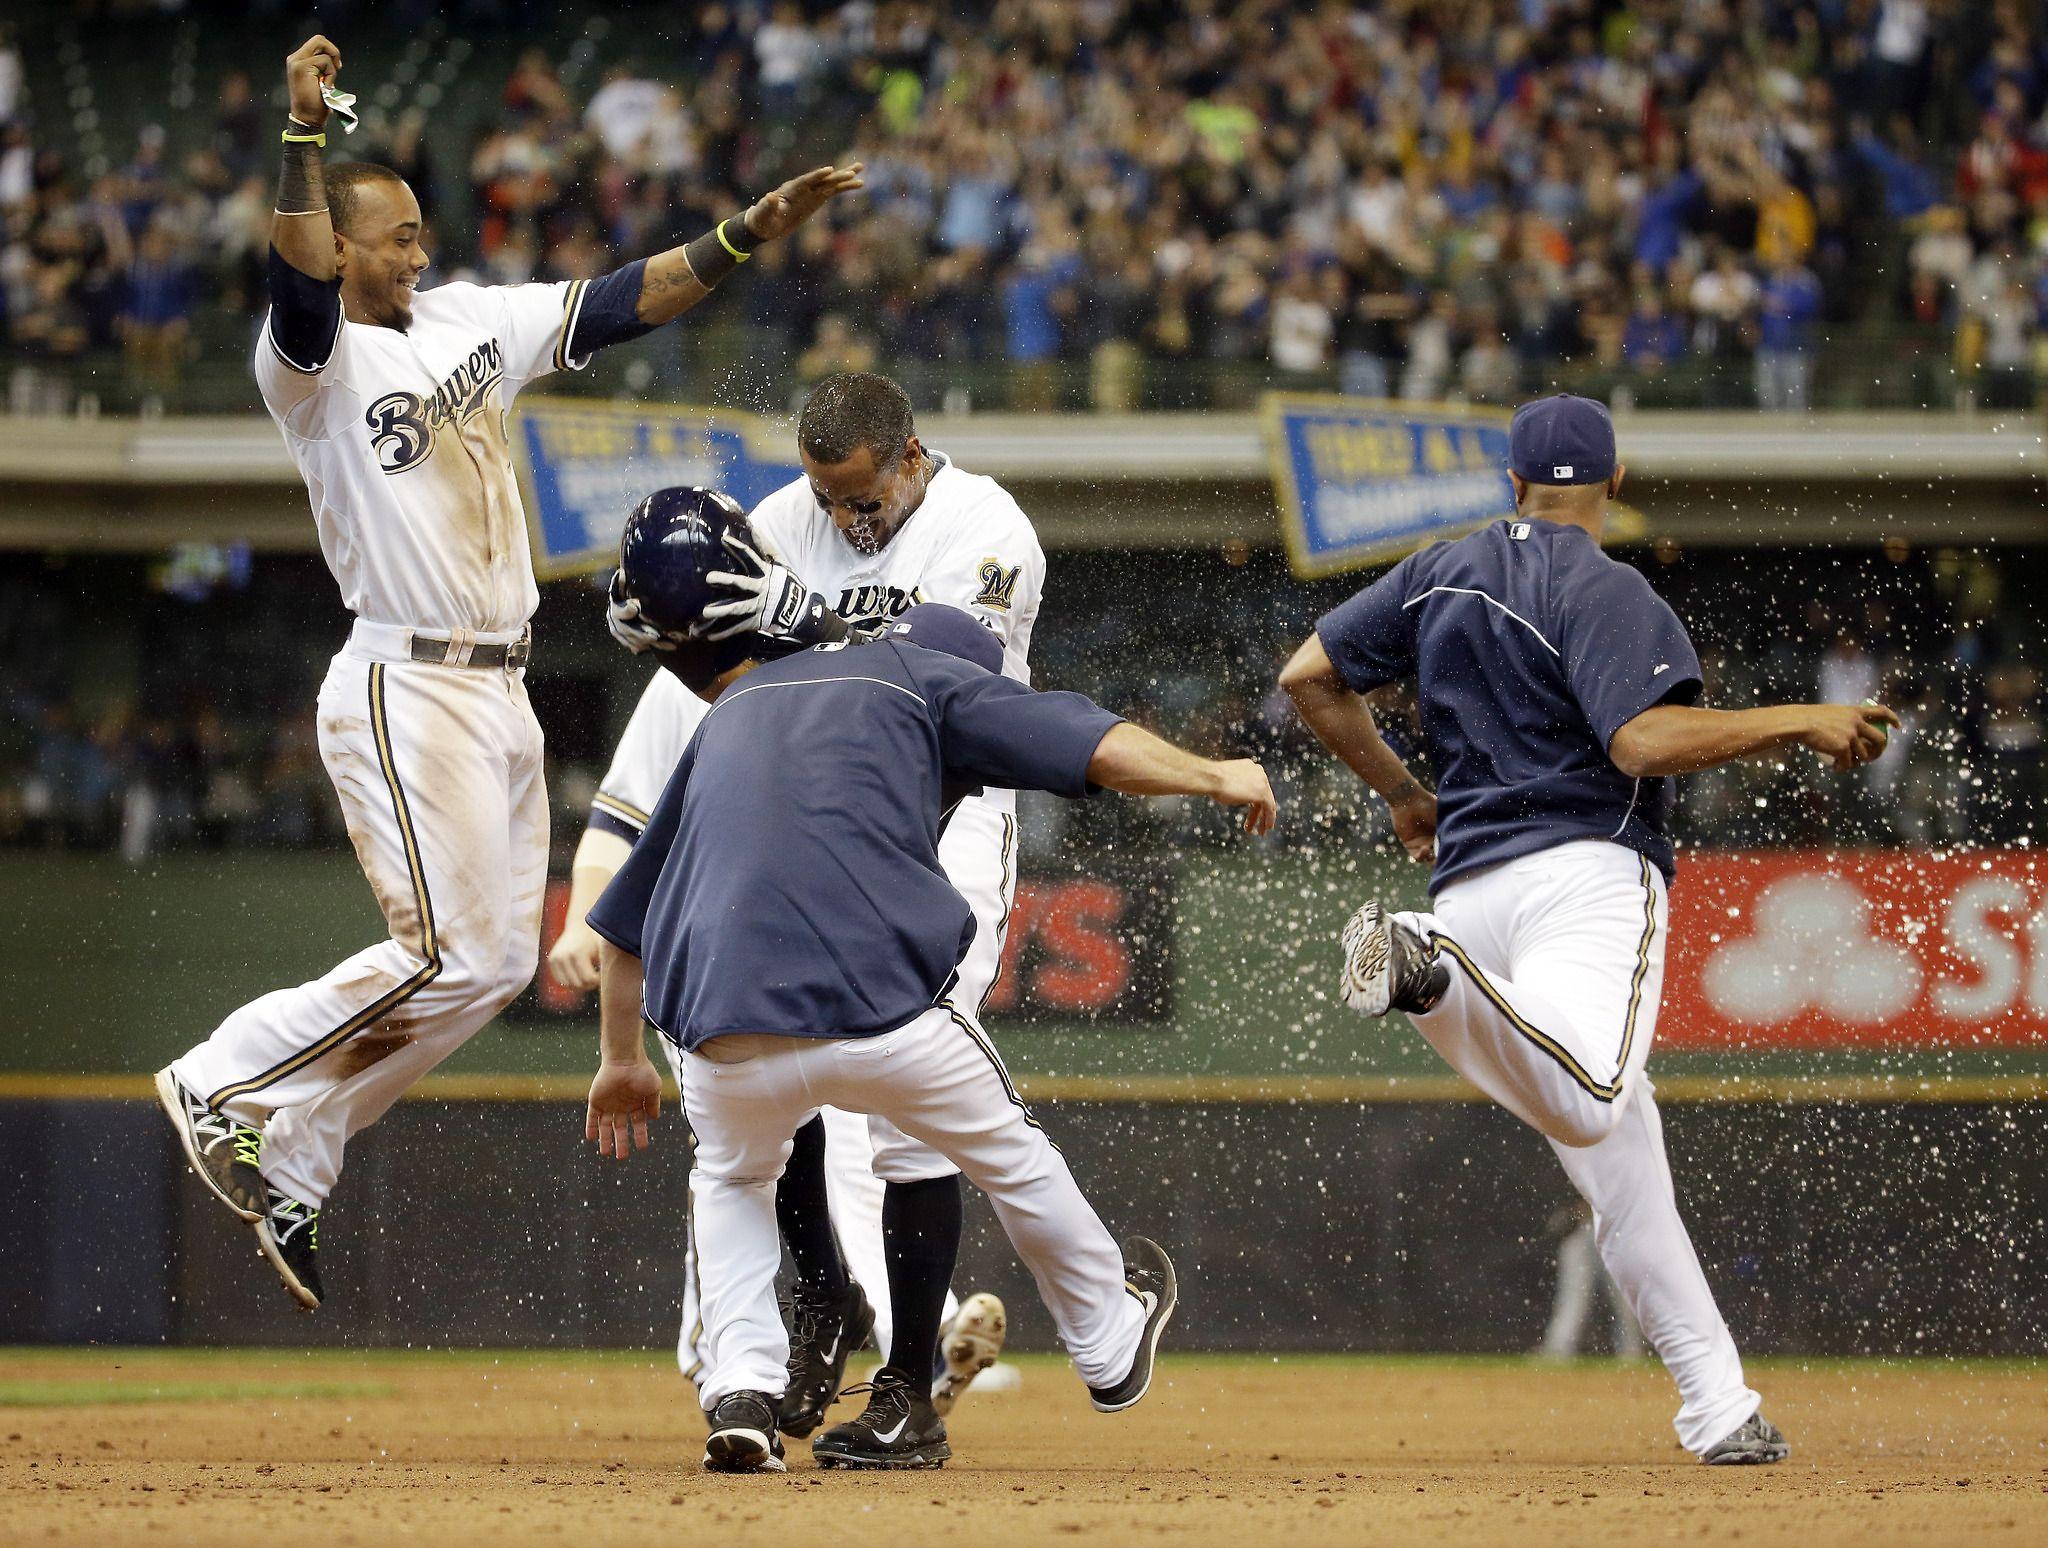 Khris Davis' big hit gives Brewers ninthinning victory